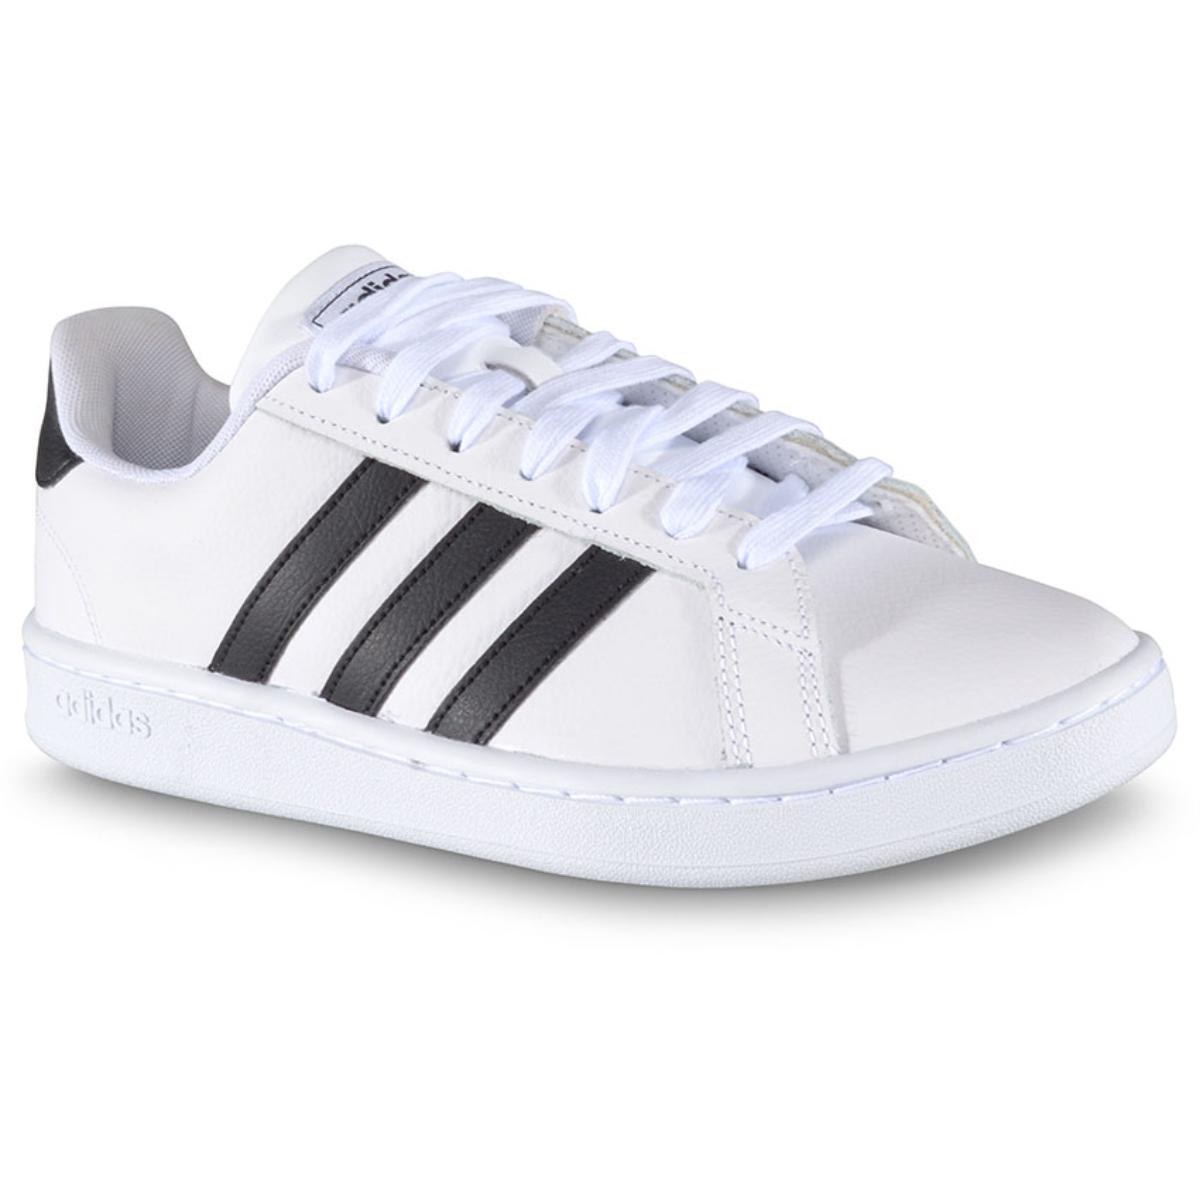 Tênis Masculino Adidas Ew0556 Grand Court  Branco/preto